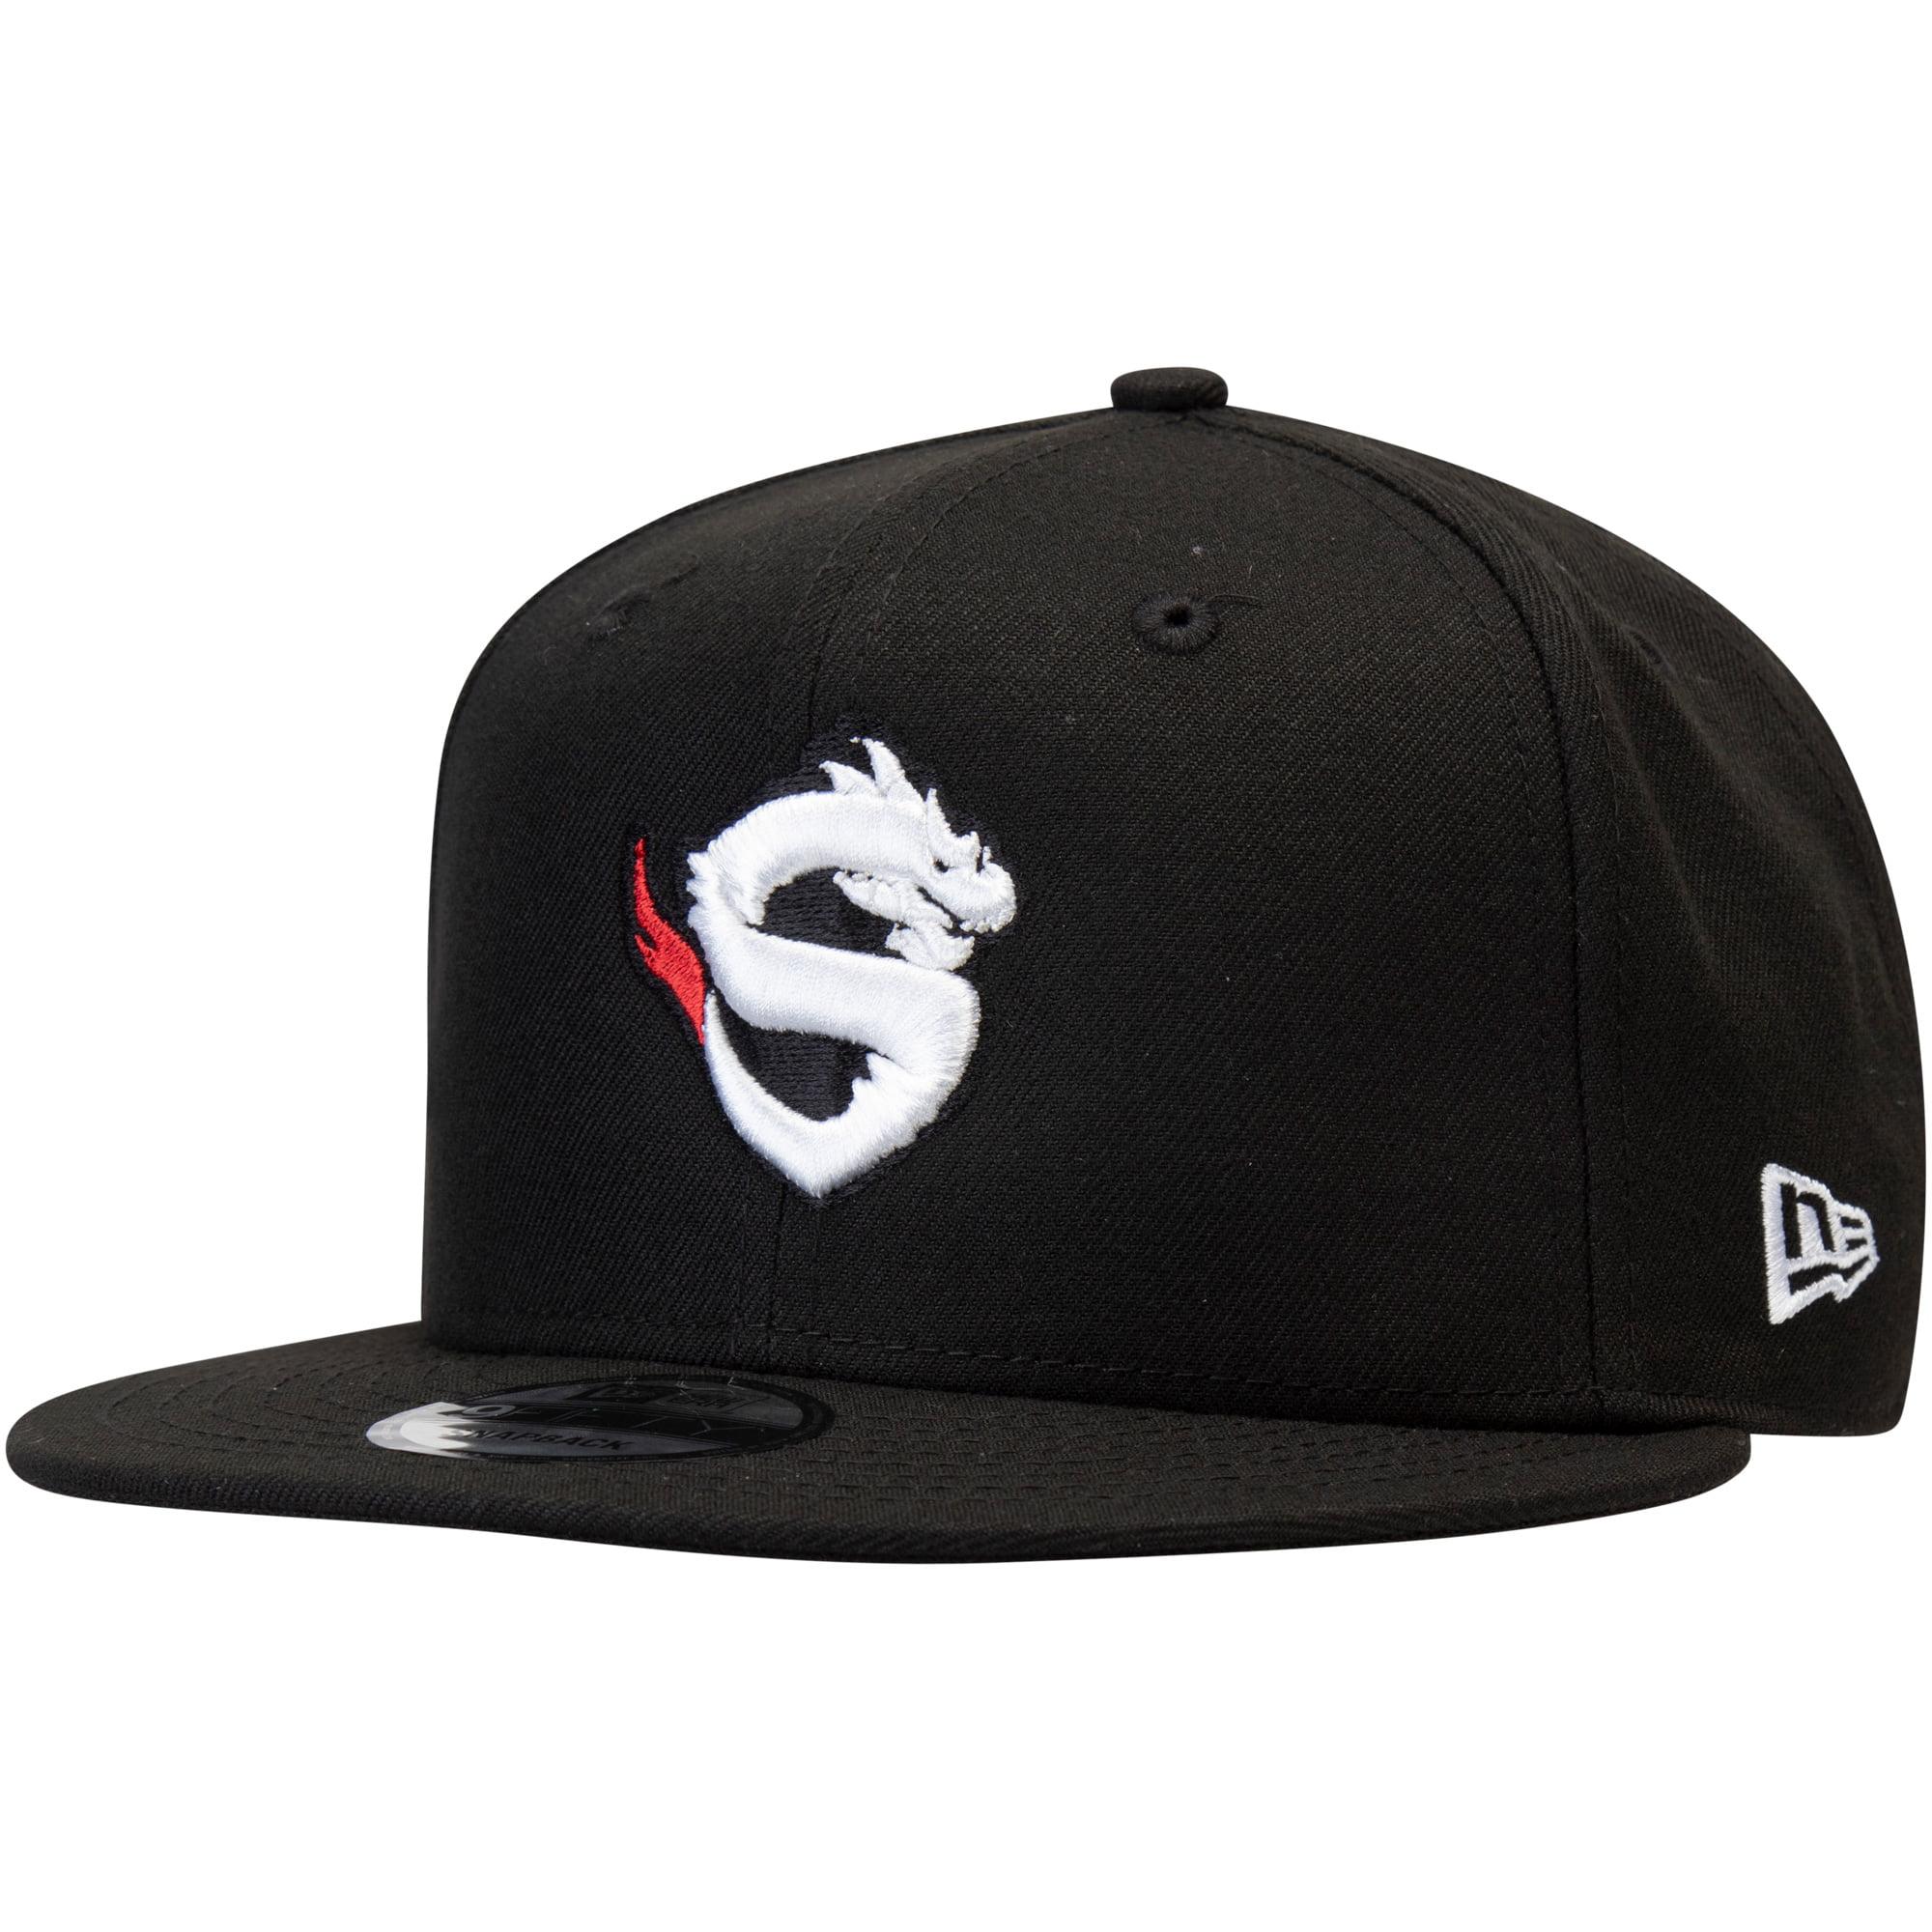 Shanghai Dragons Overwatch League New Era Solid Team Adjustable Snapback Hat - Black - OSFA